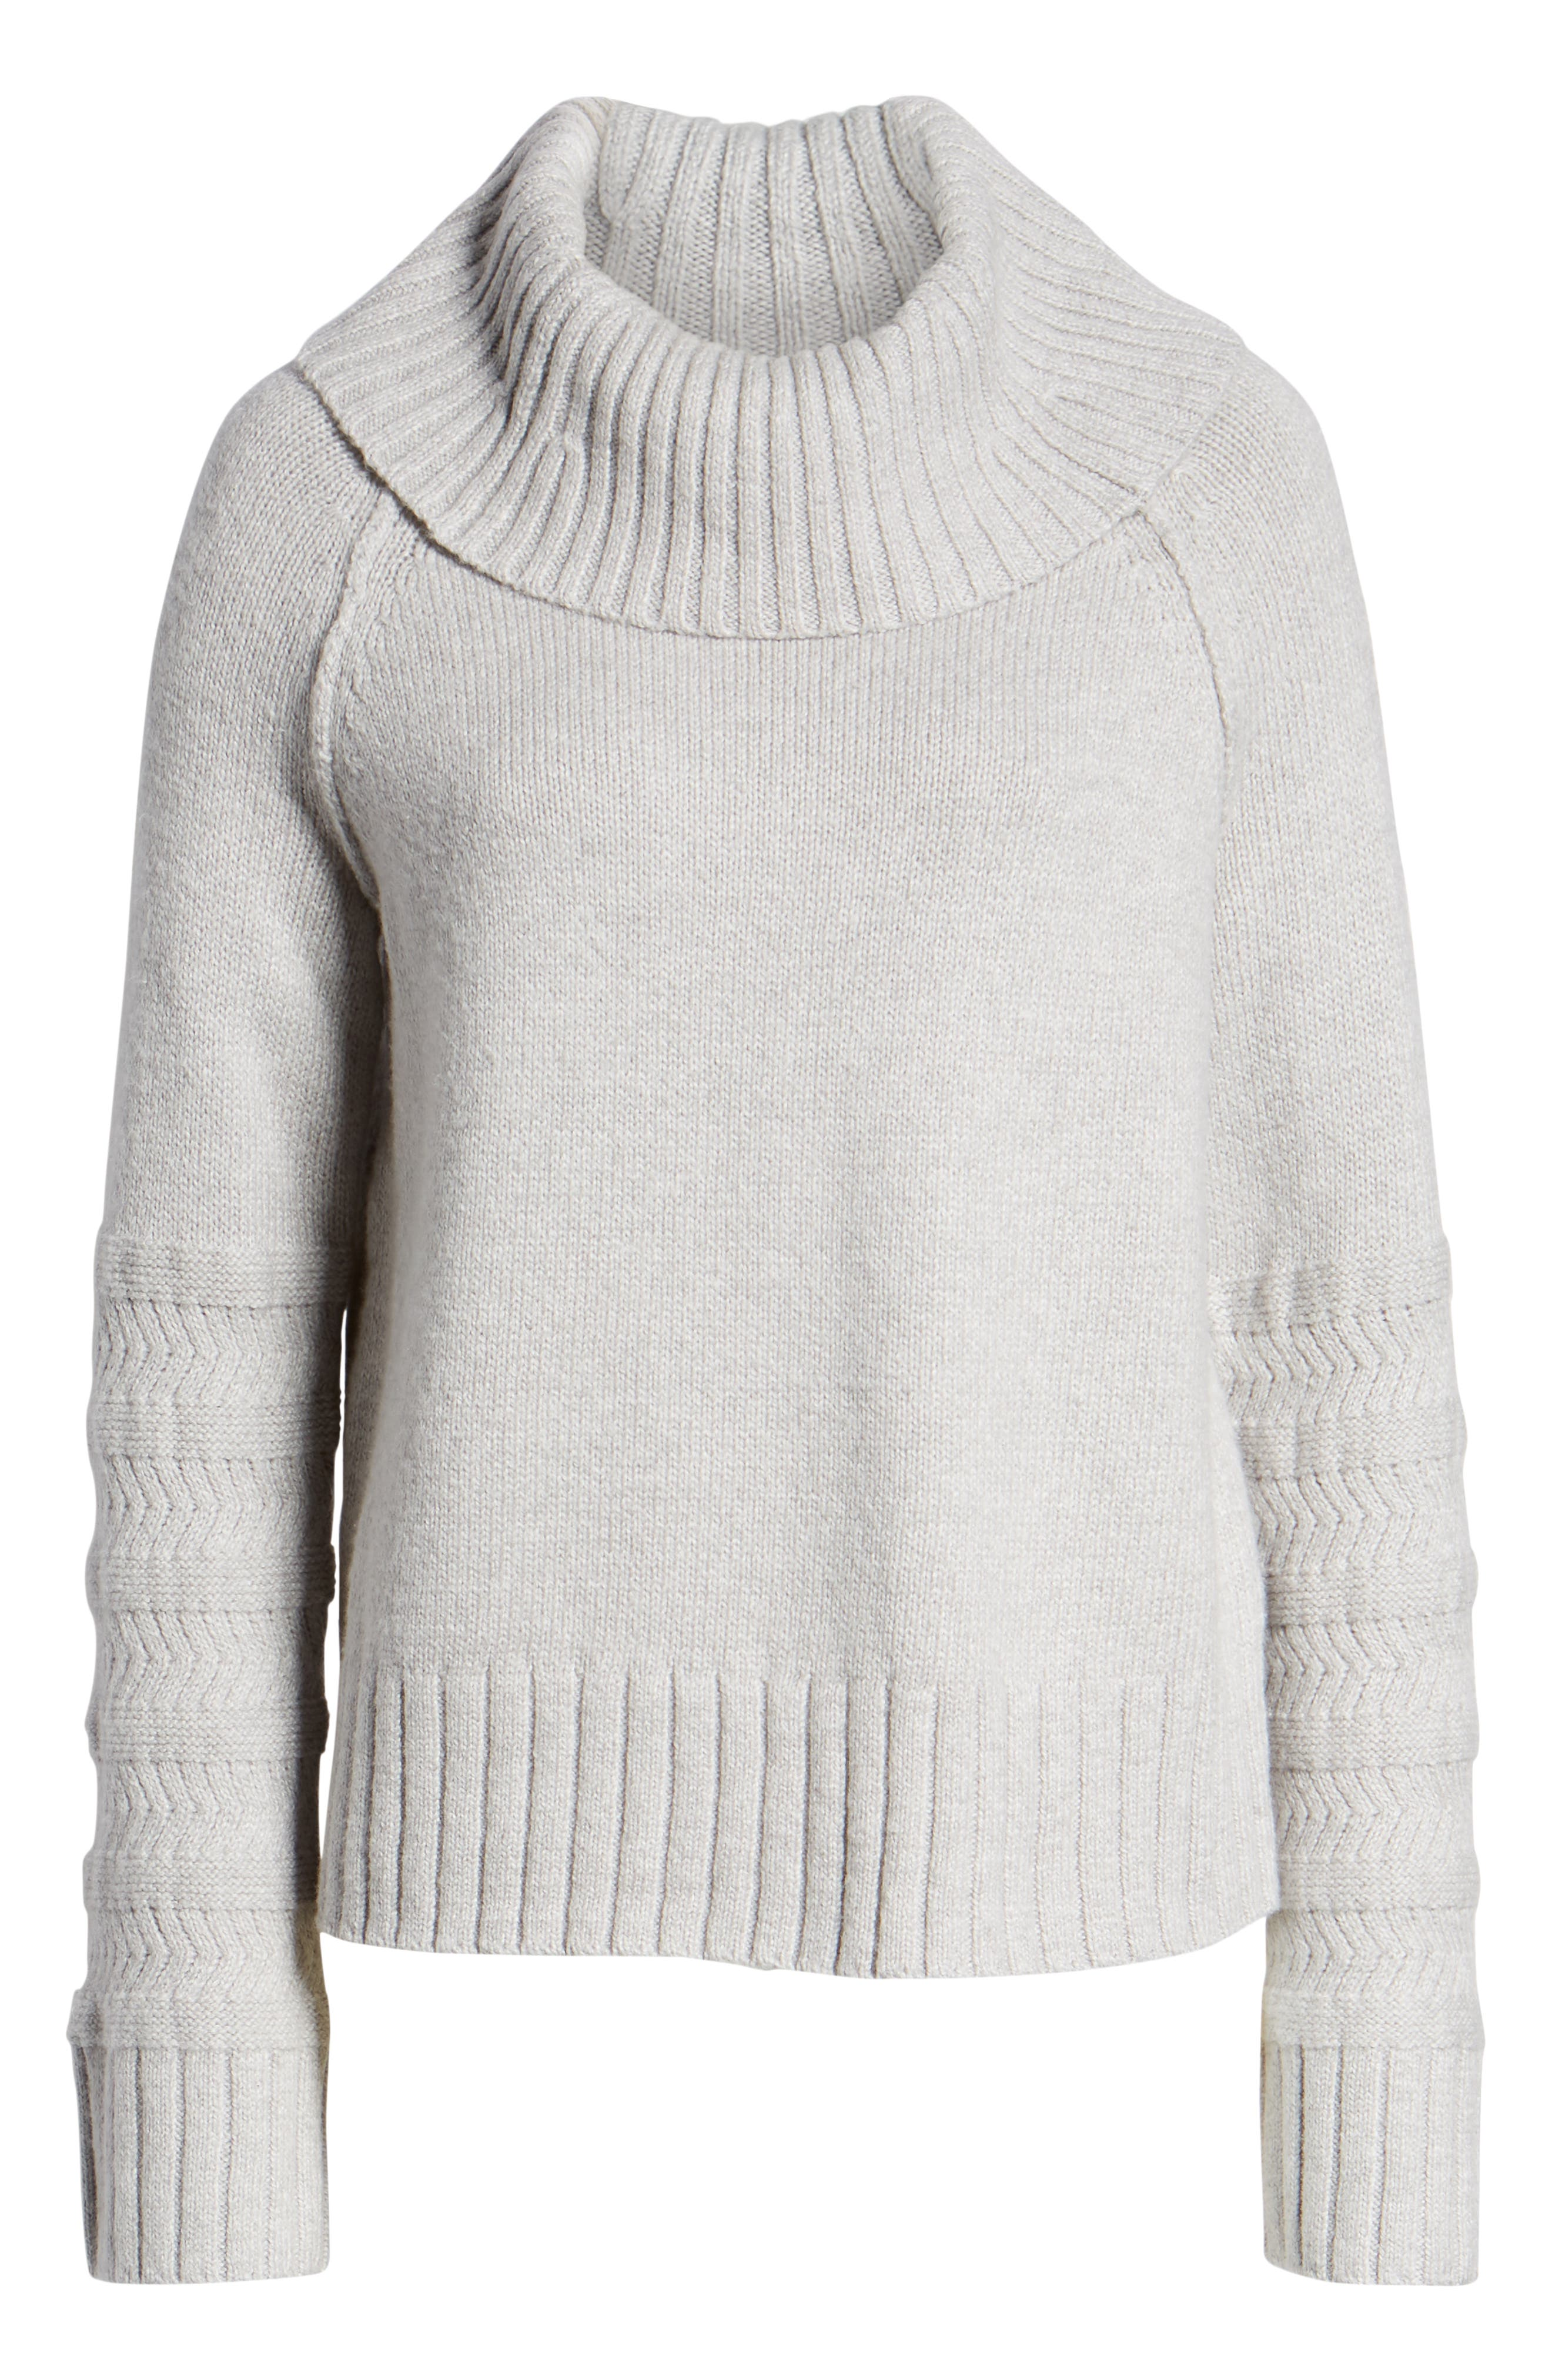 Turtleneck Sweater,                             Alternate thumbnail 6, color,                             GREY LIGHT HEATHER